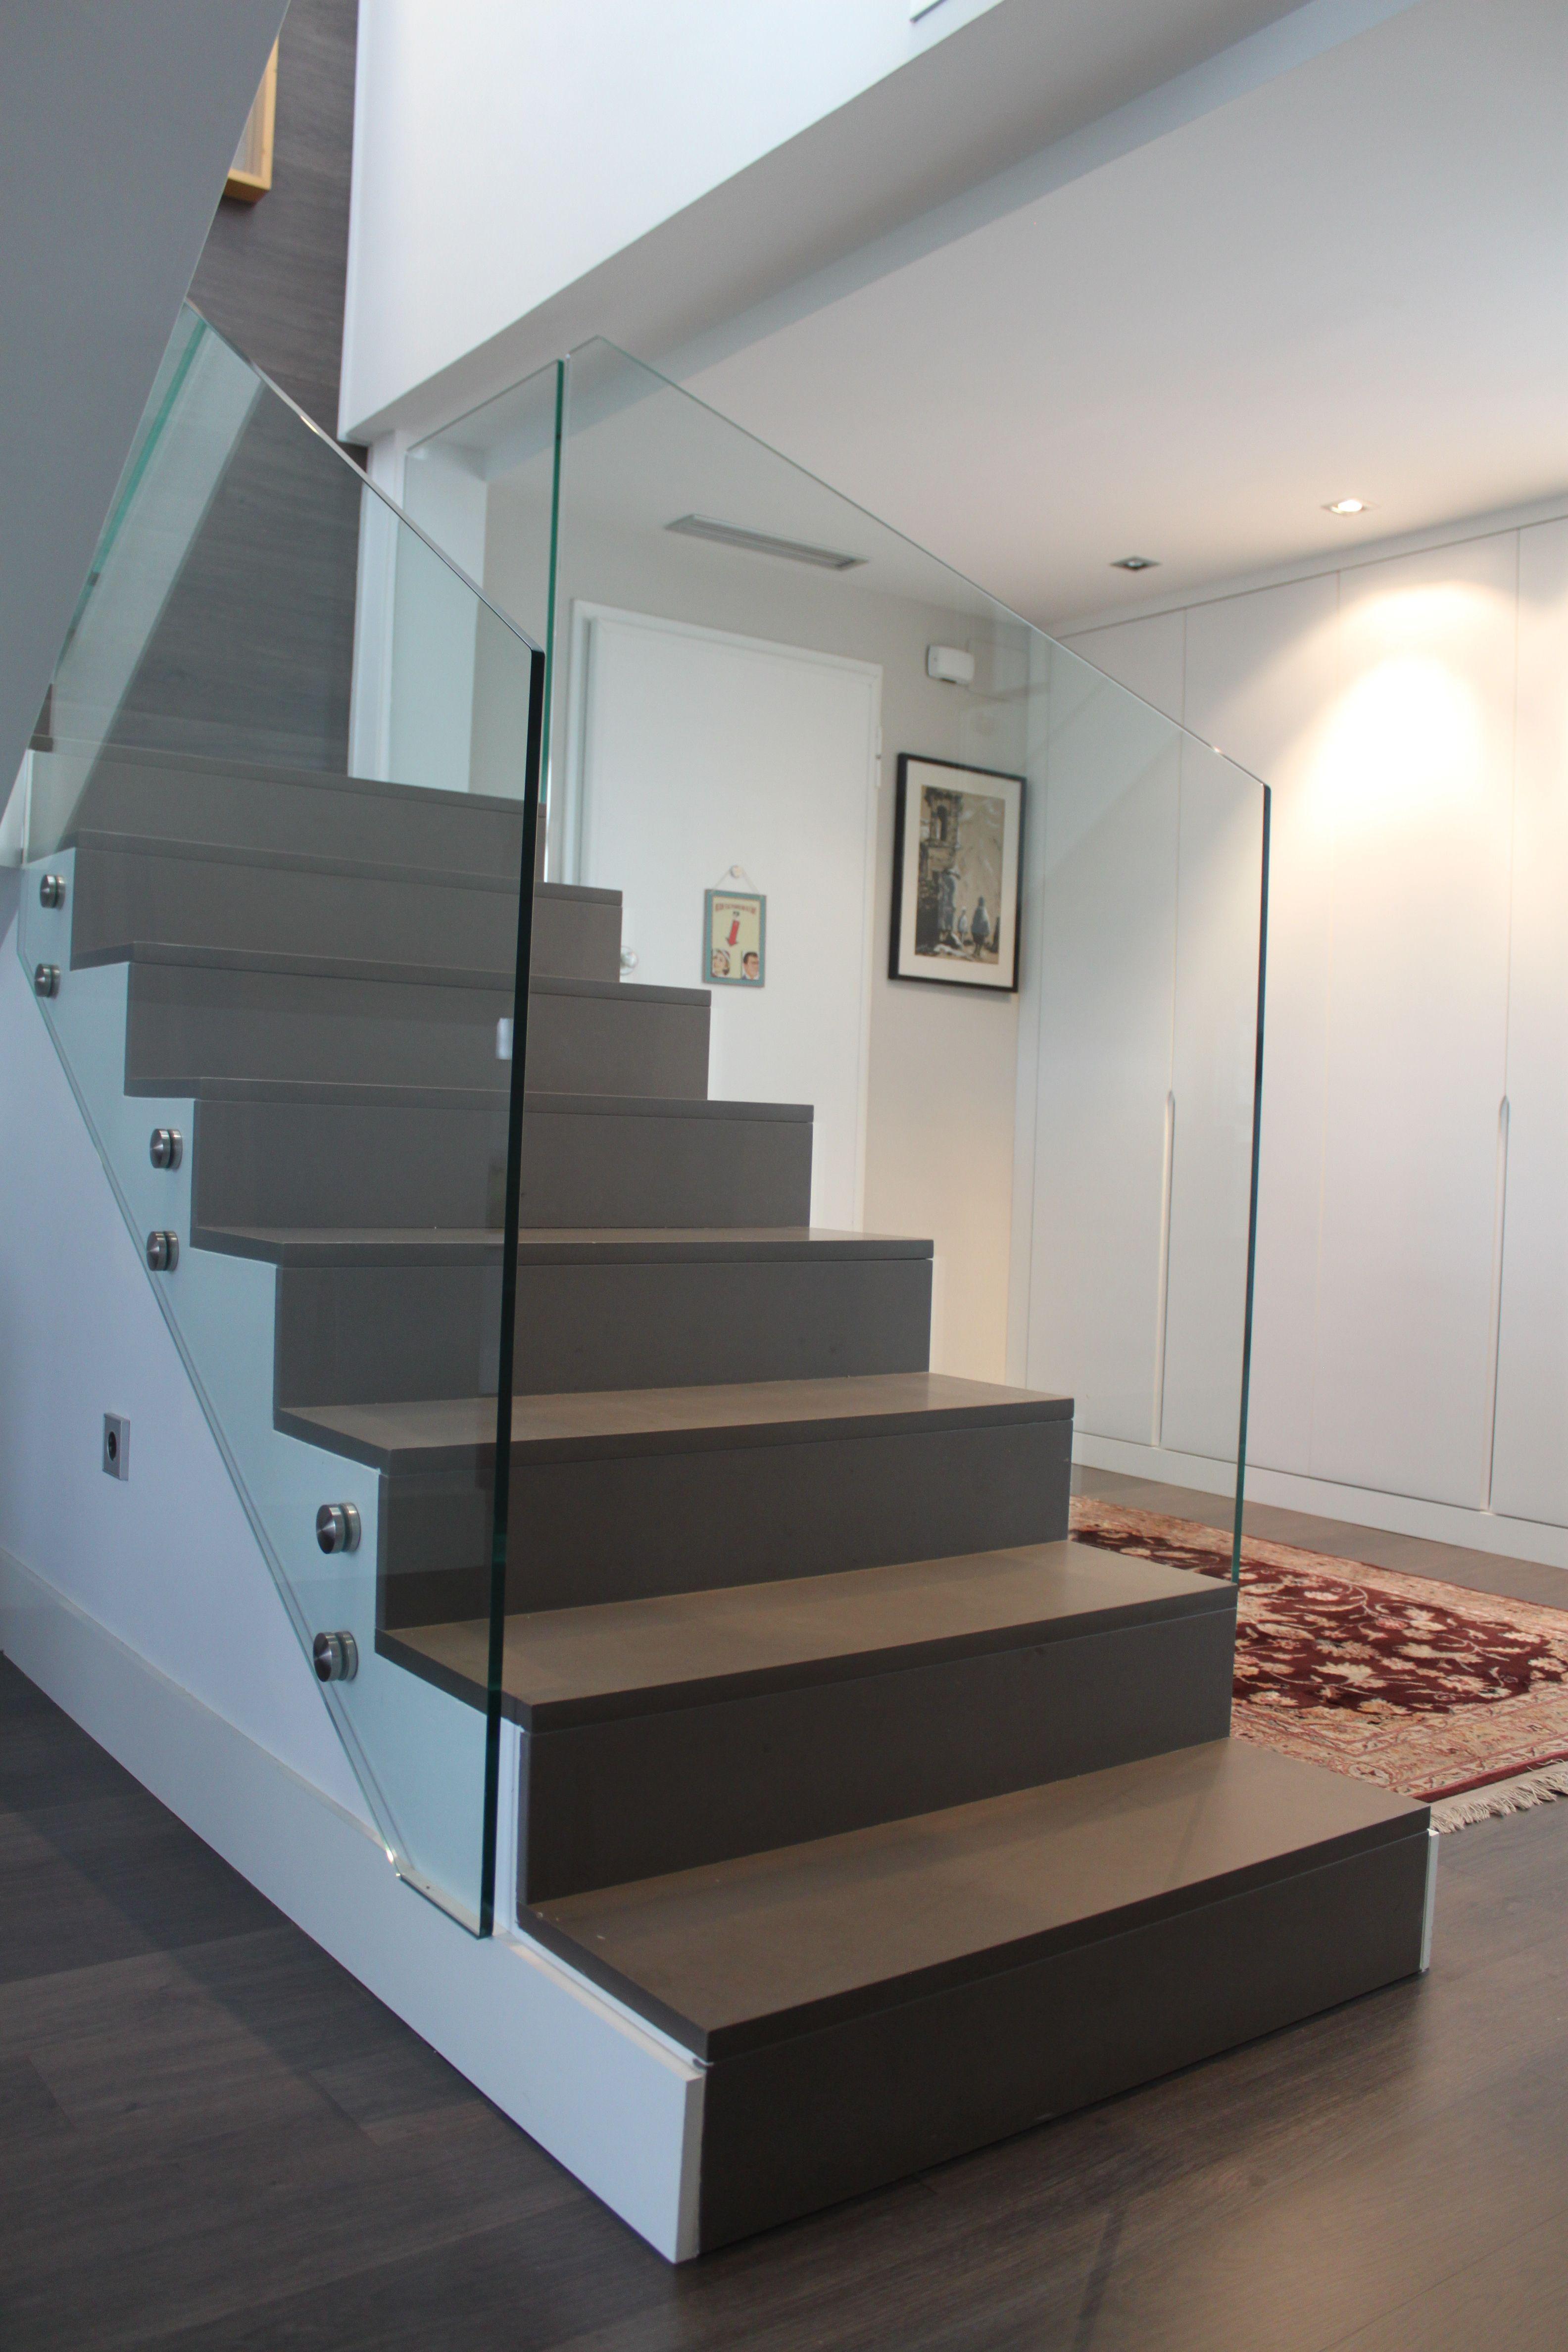 Escalera dise o vivienda tico duplex construcci n obra - Duplex de diseno ...